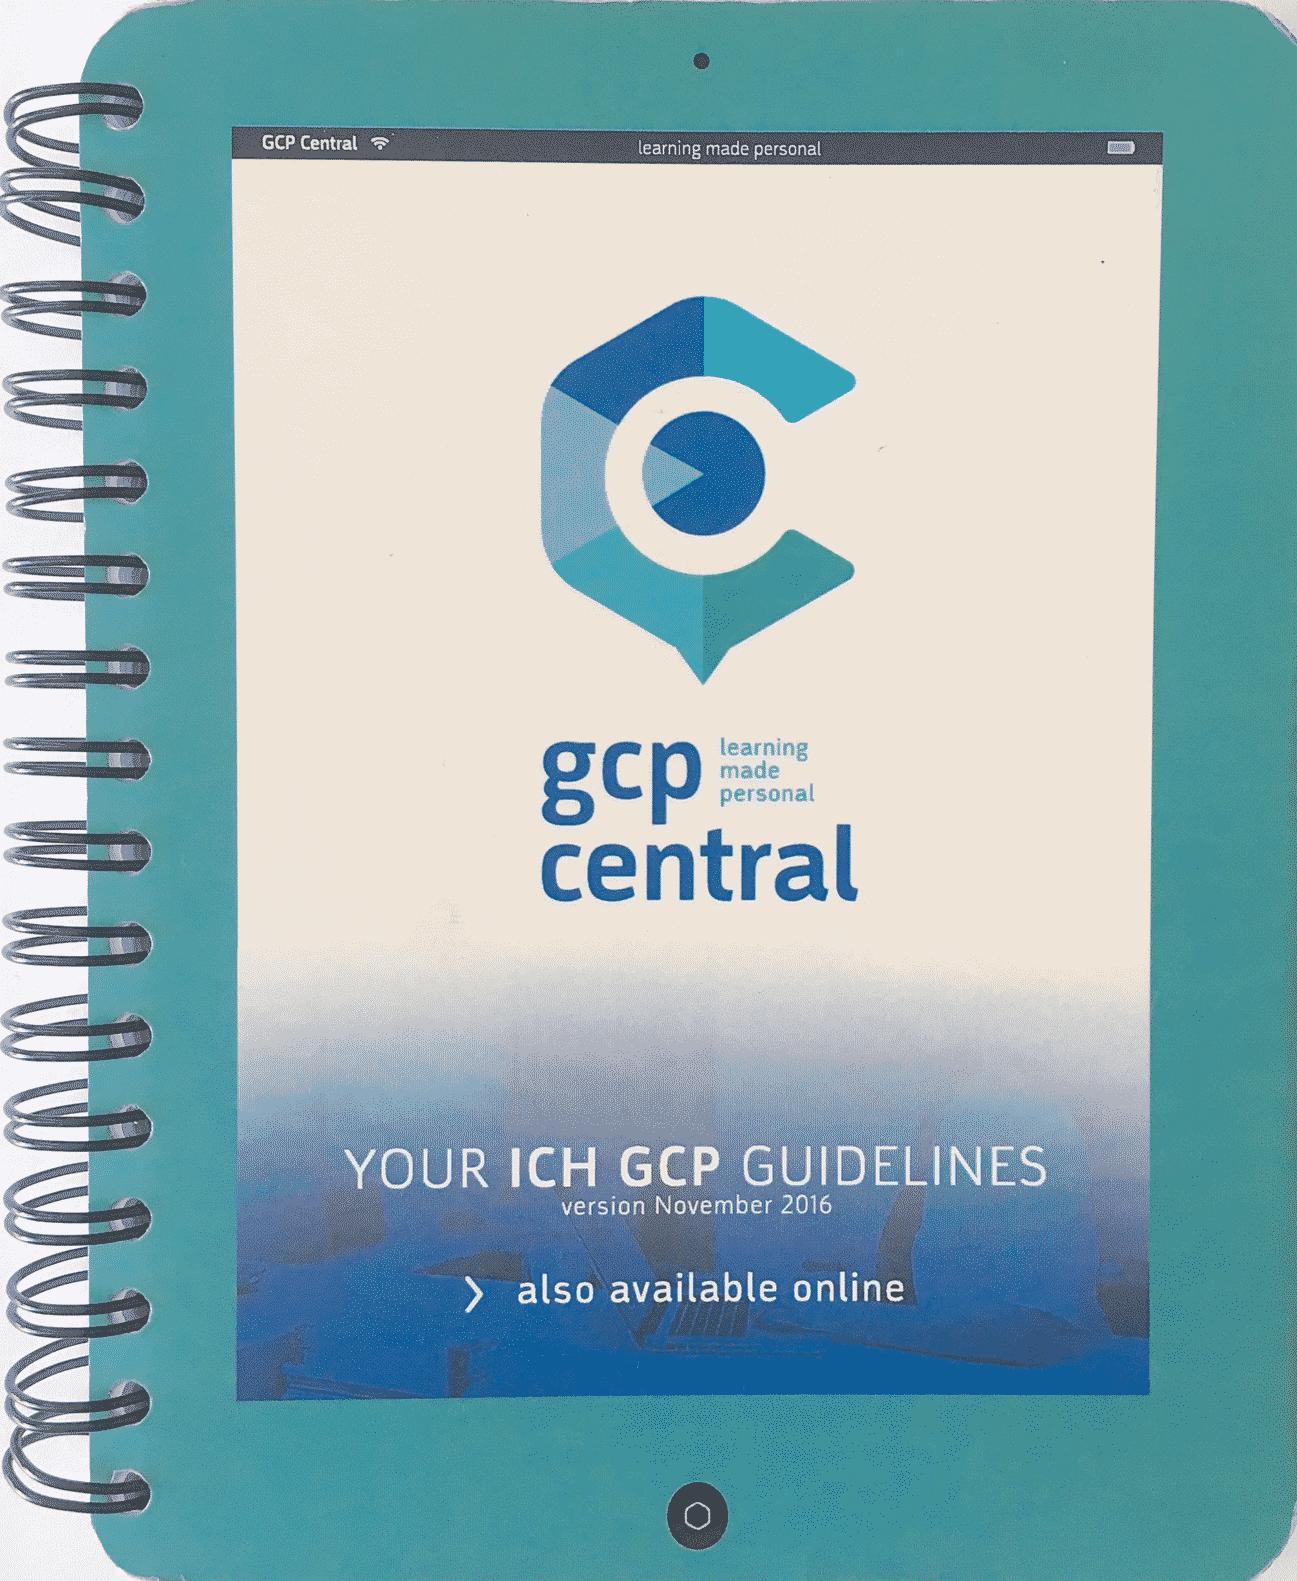 ICH-GCP boekje Nederlands